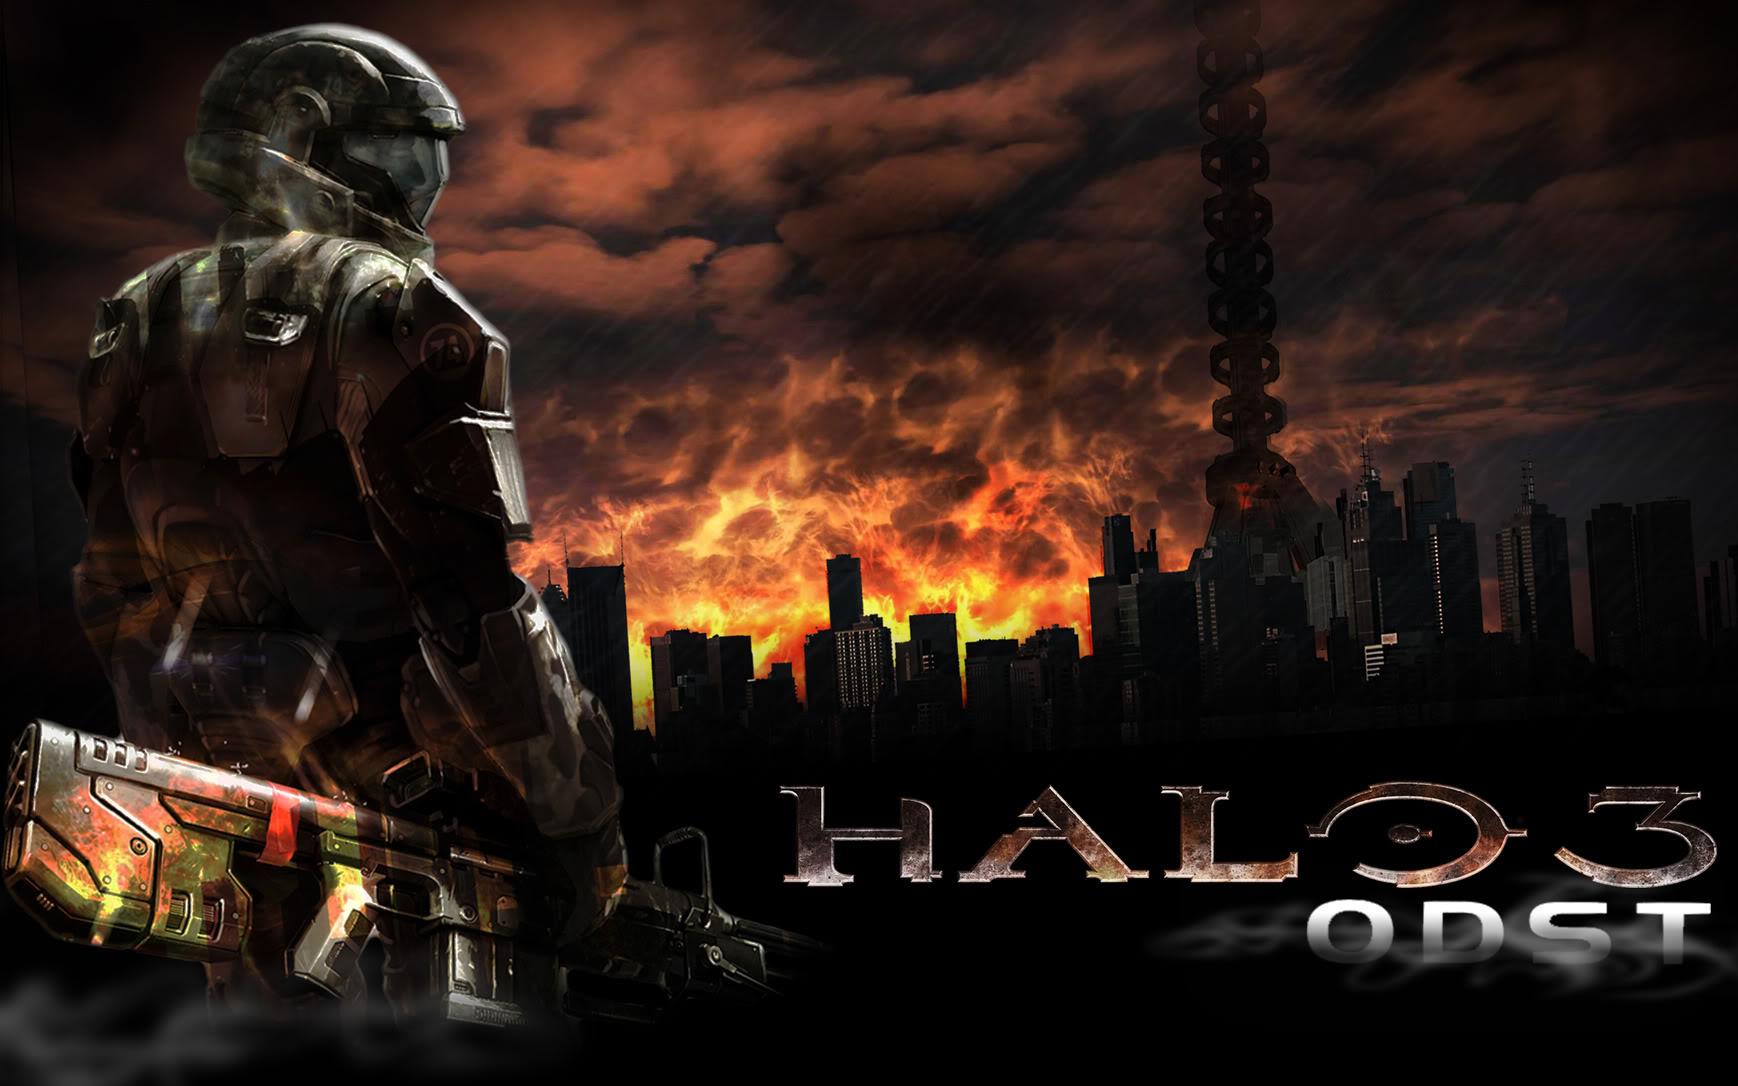 Free Download Halo 3 Wallpaper Wallpaper Wallpaper Hd